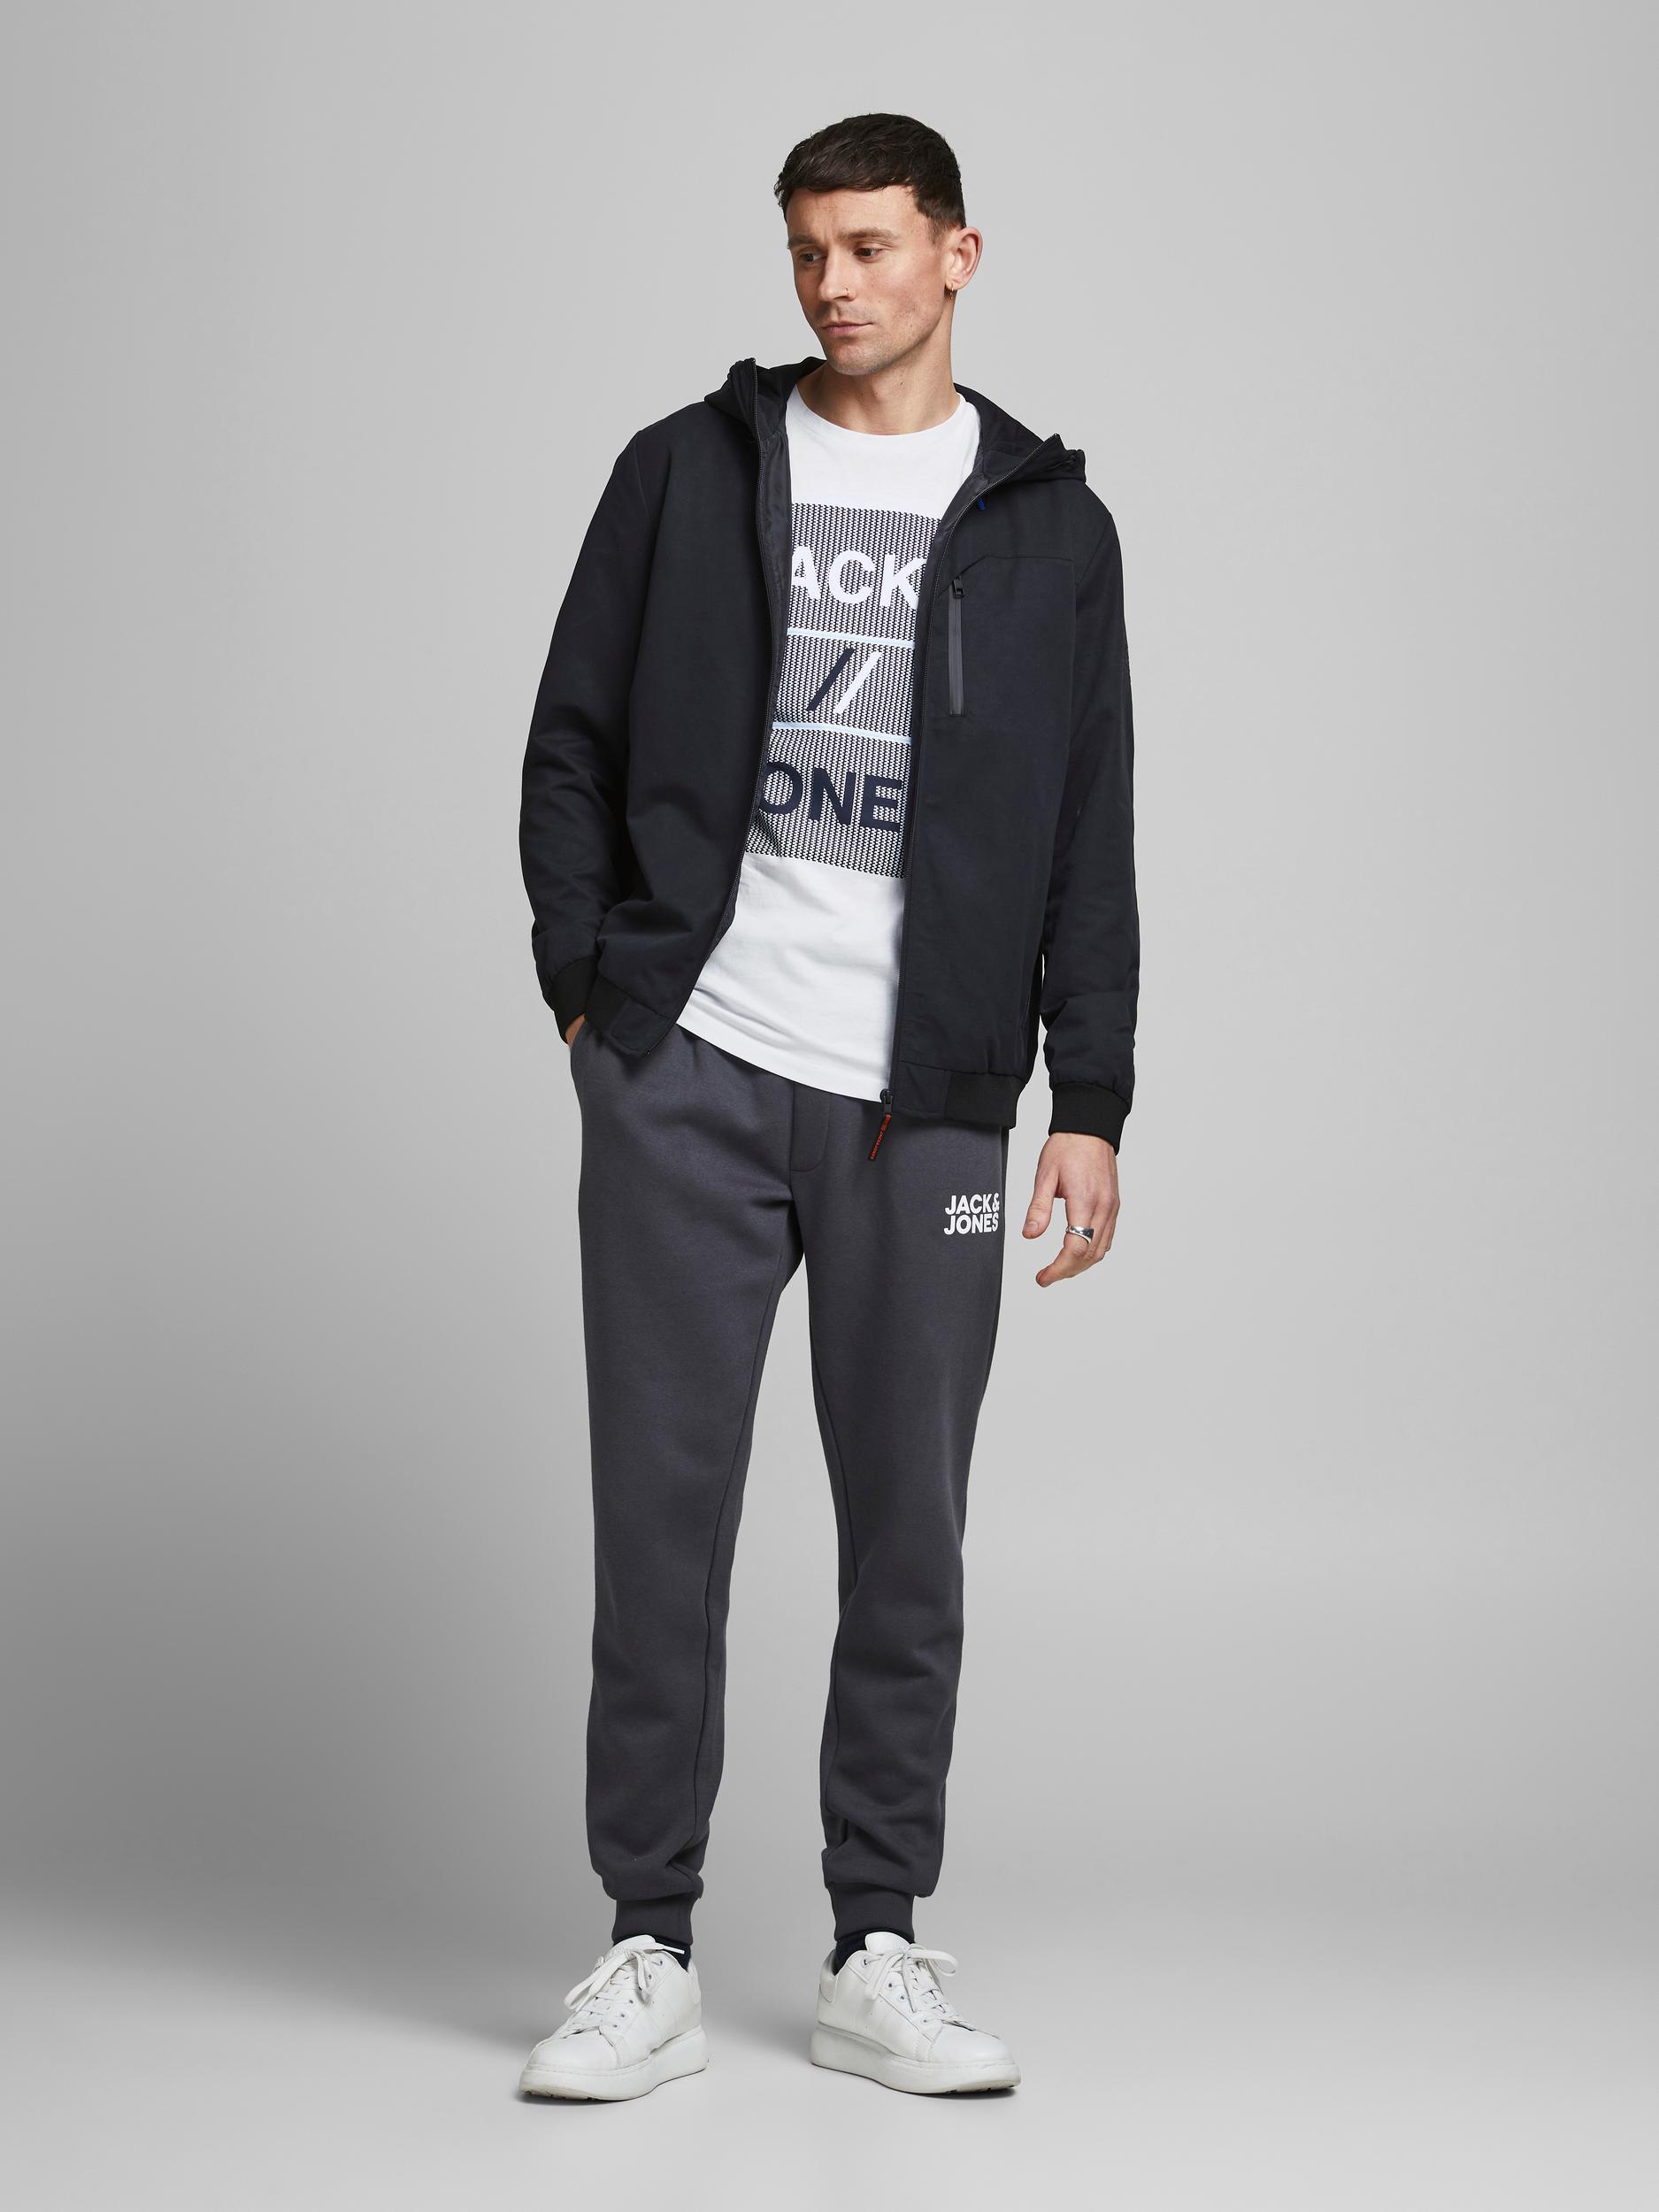 Corojar tee ss T-shirt JACK&JONES   T-shirt   12188039WHITE